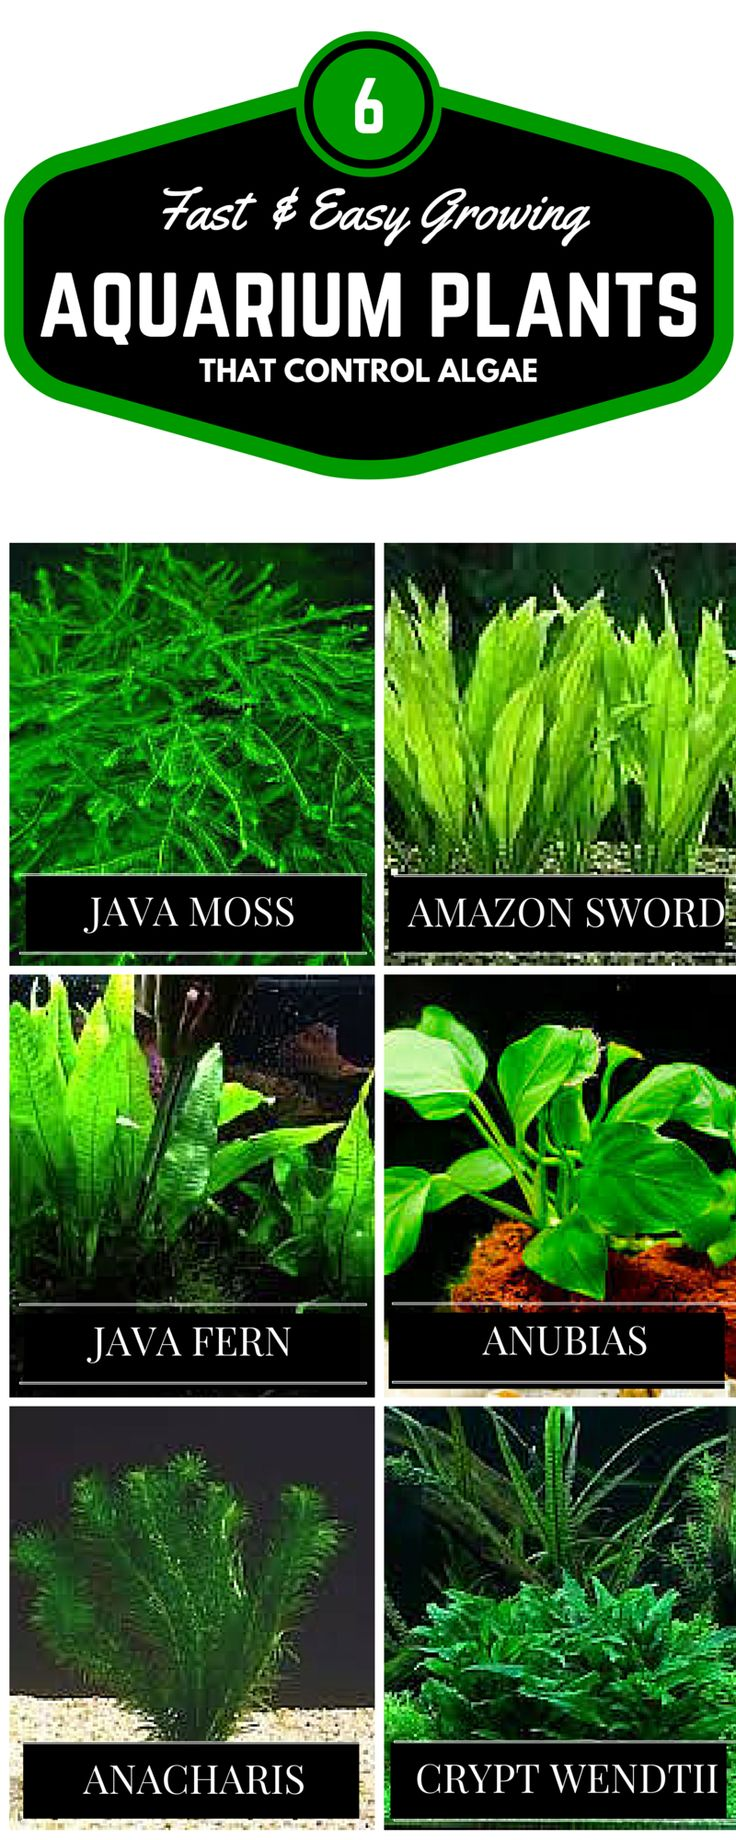 Best fish for aquarium plants - 37 Easy Ways To Control Algae And Get Crystal Clear Aquarium Water